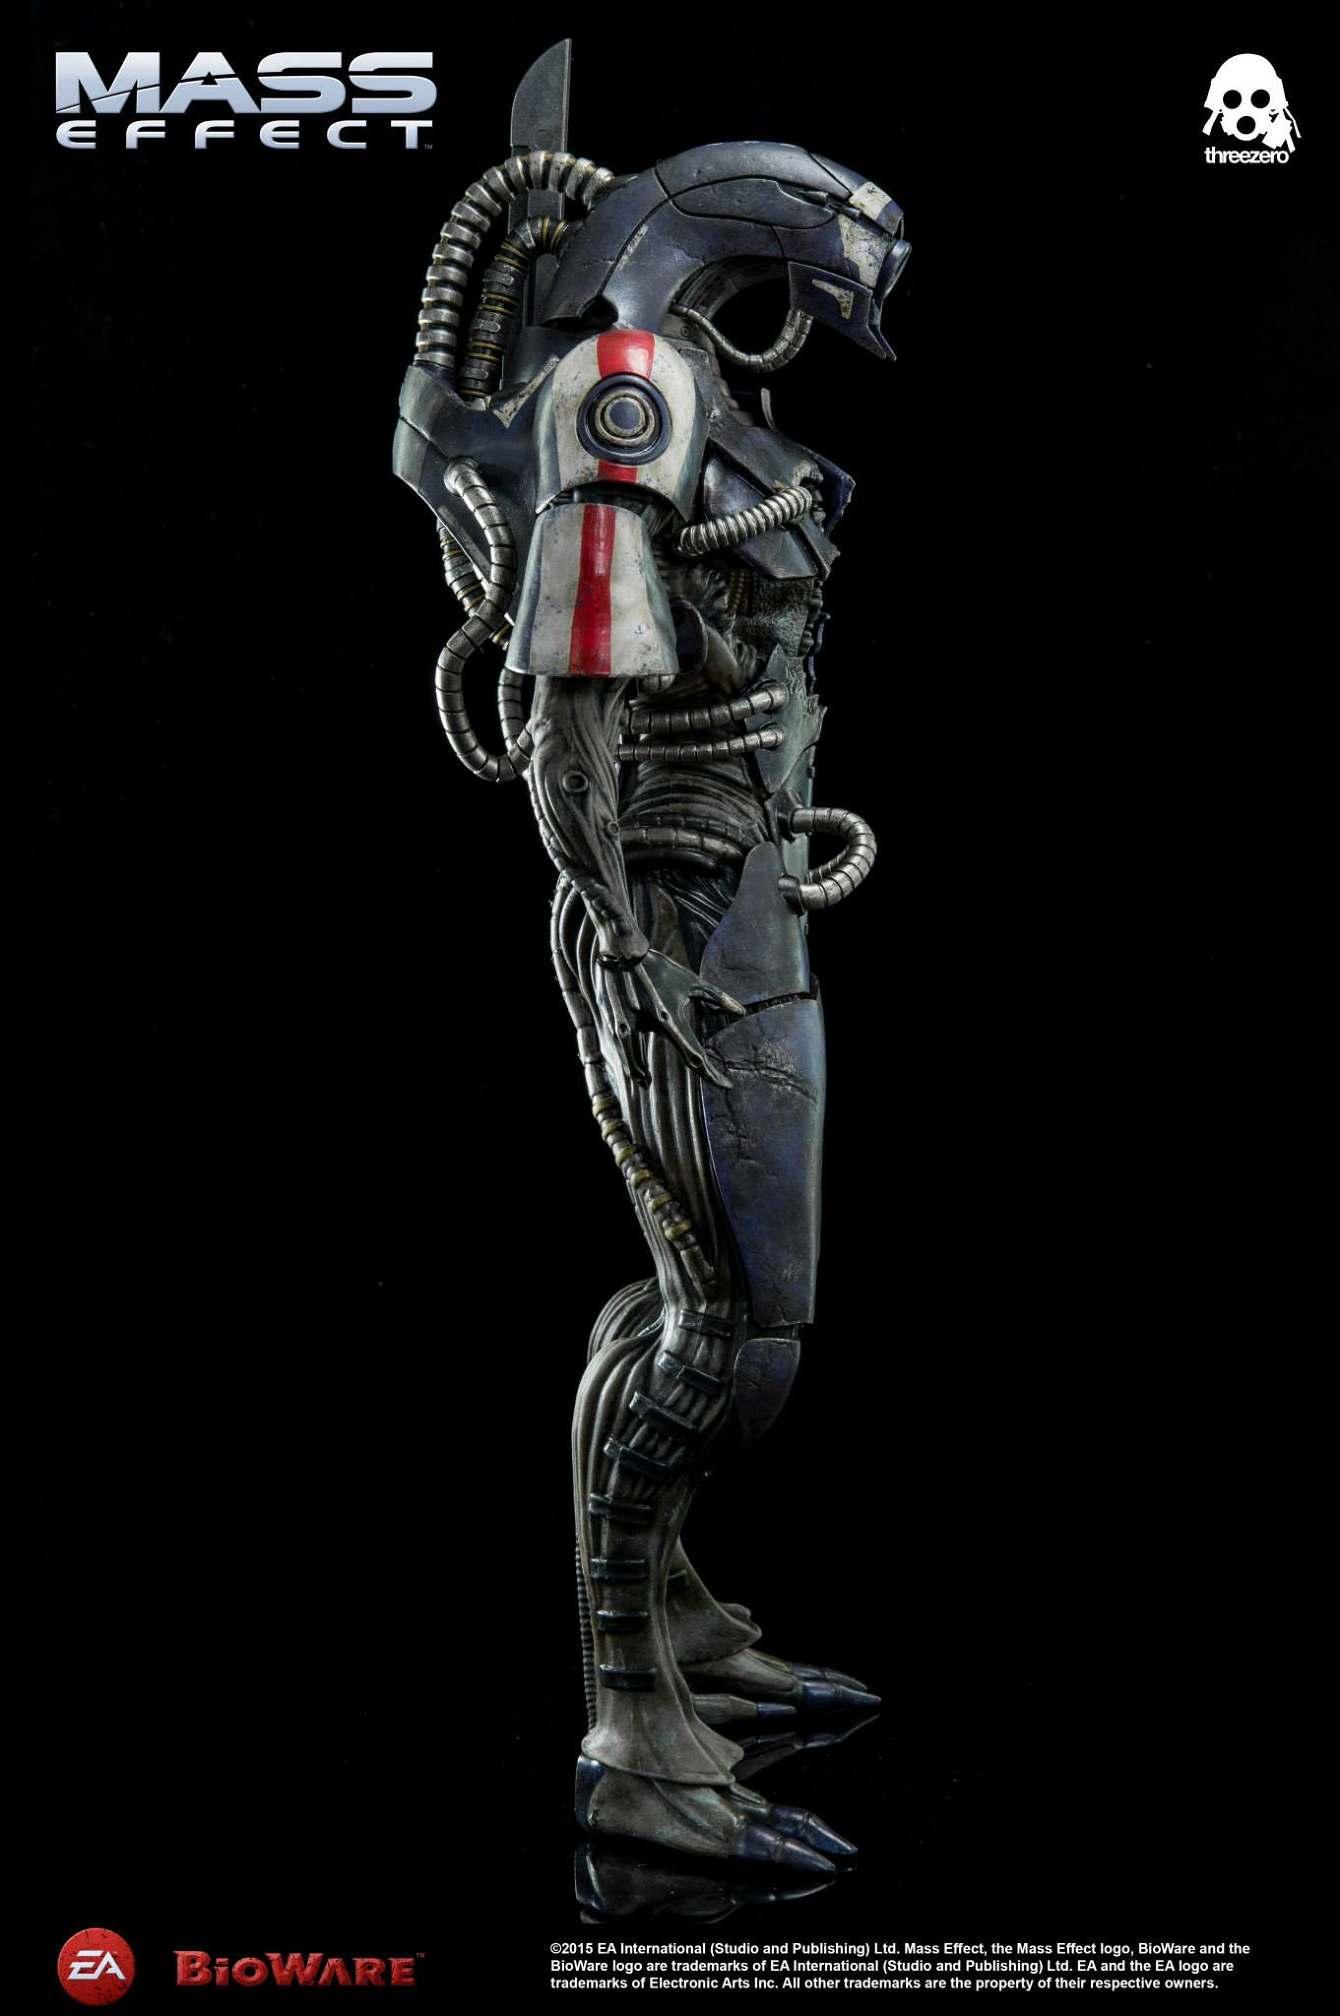 ThreeZero-Bioware-video-game-Legion-Mass-Effect-figure-13_1340_c.jpg